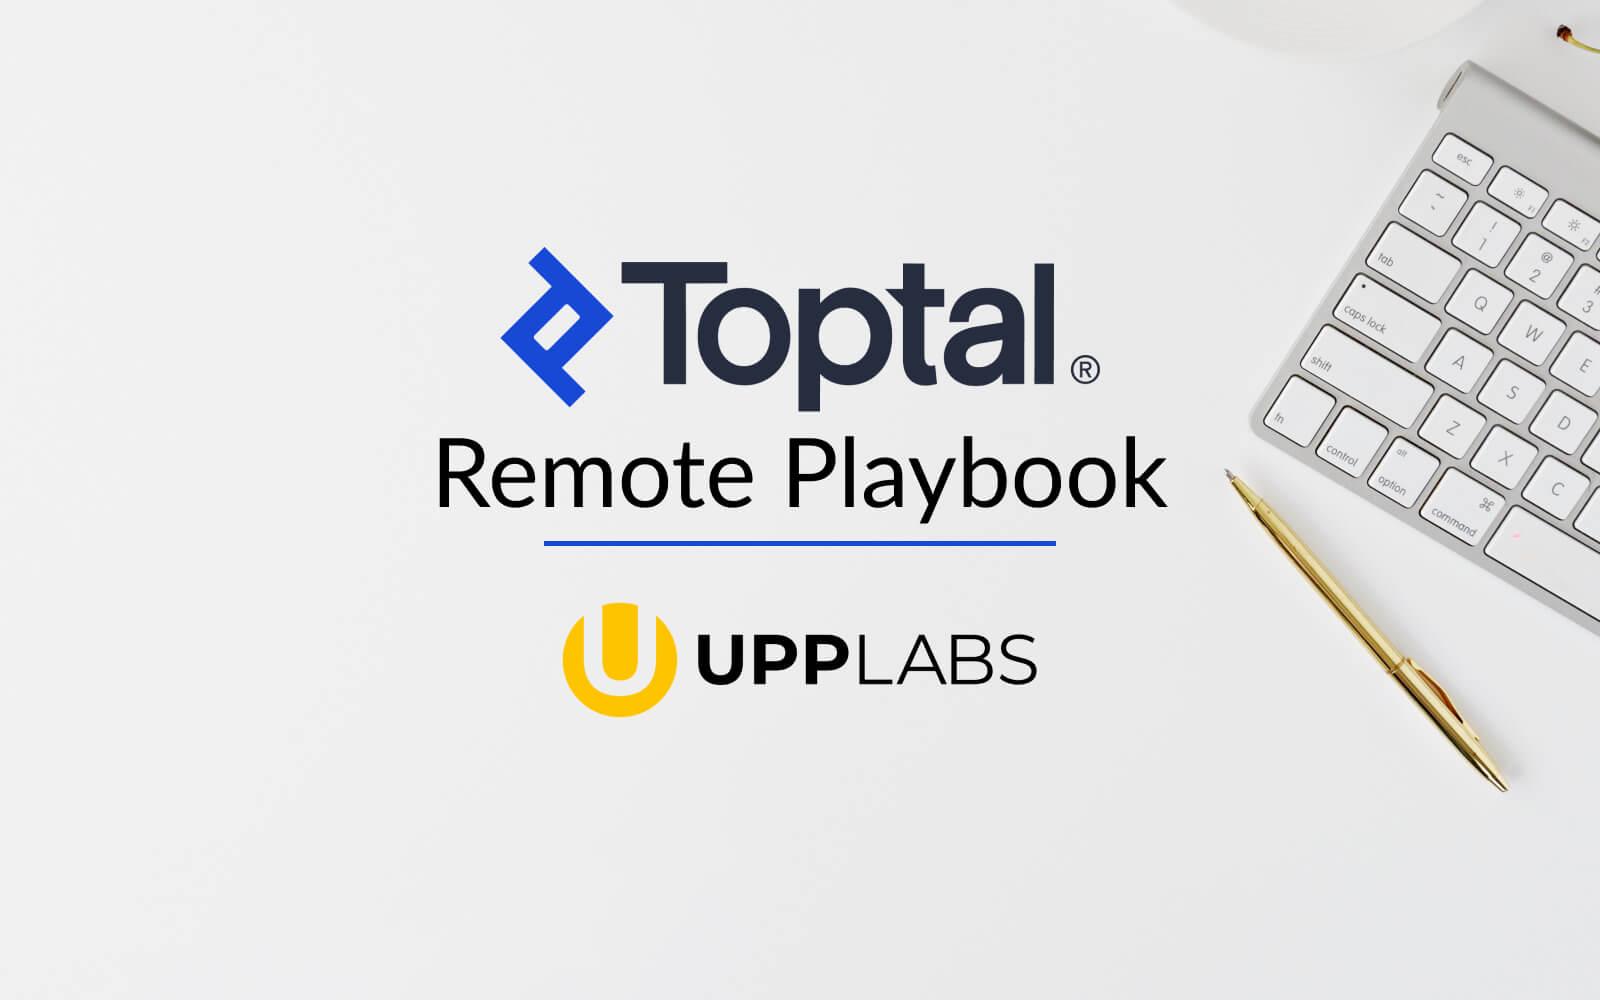 Best remote work practices: Remote Playbook by Toptal